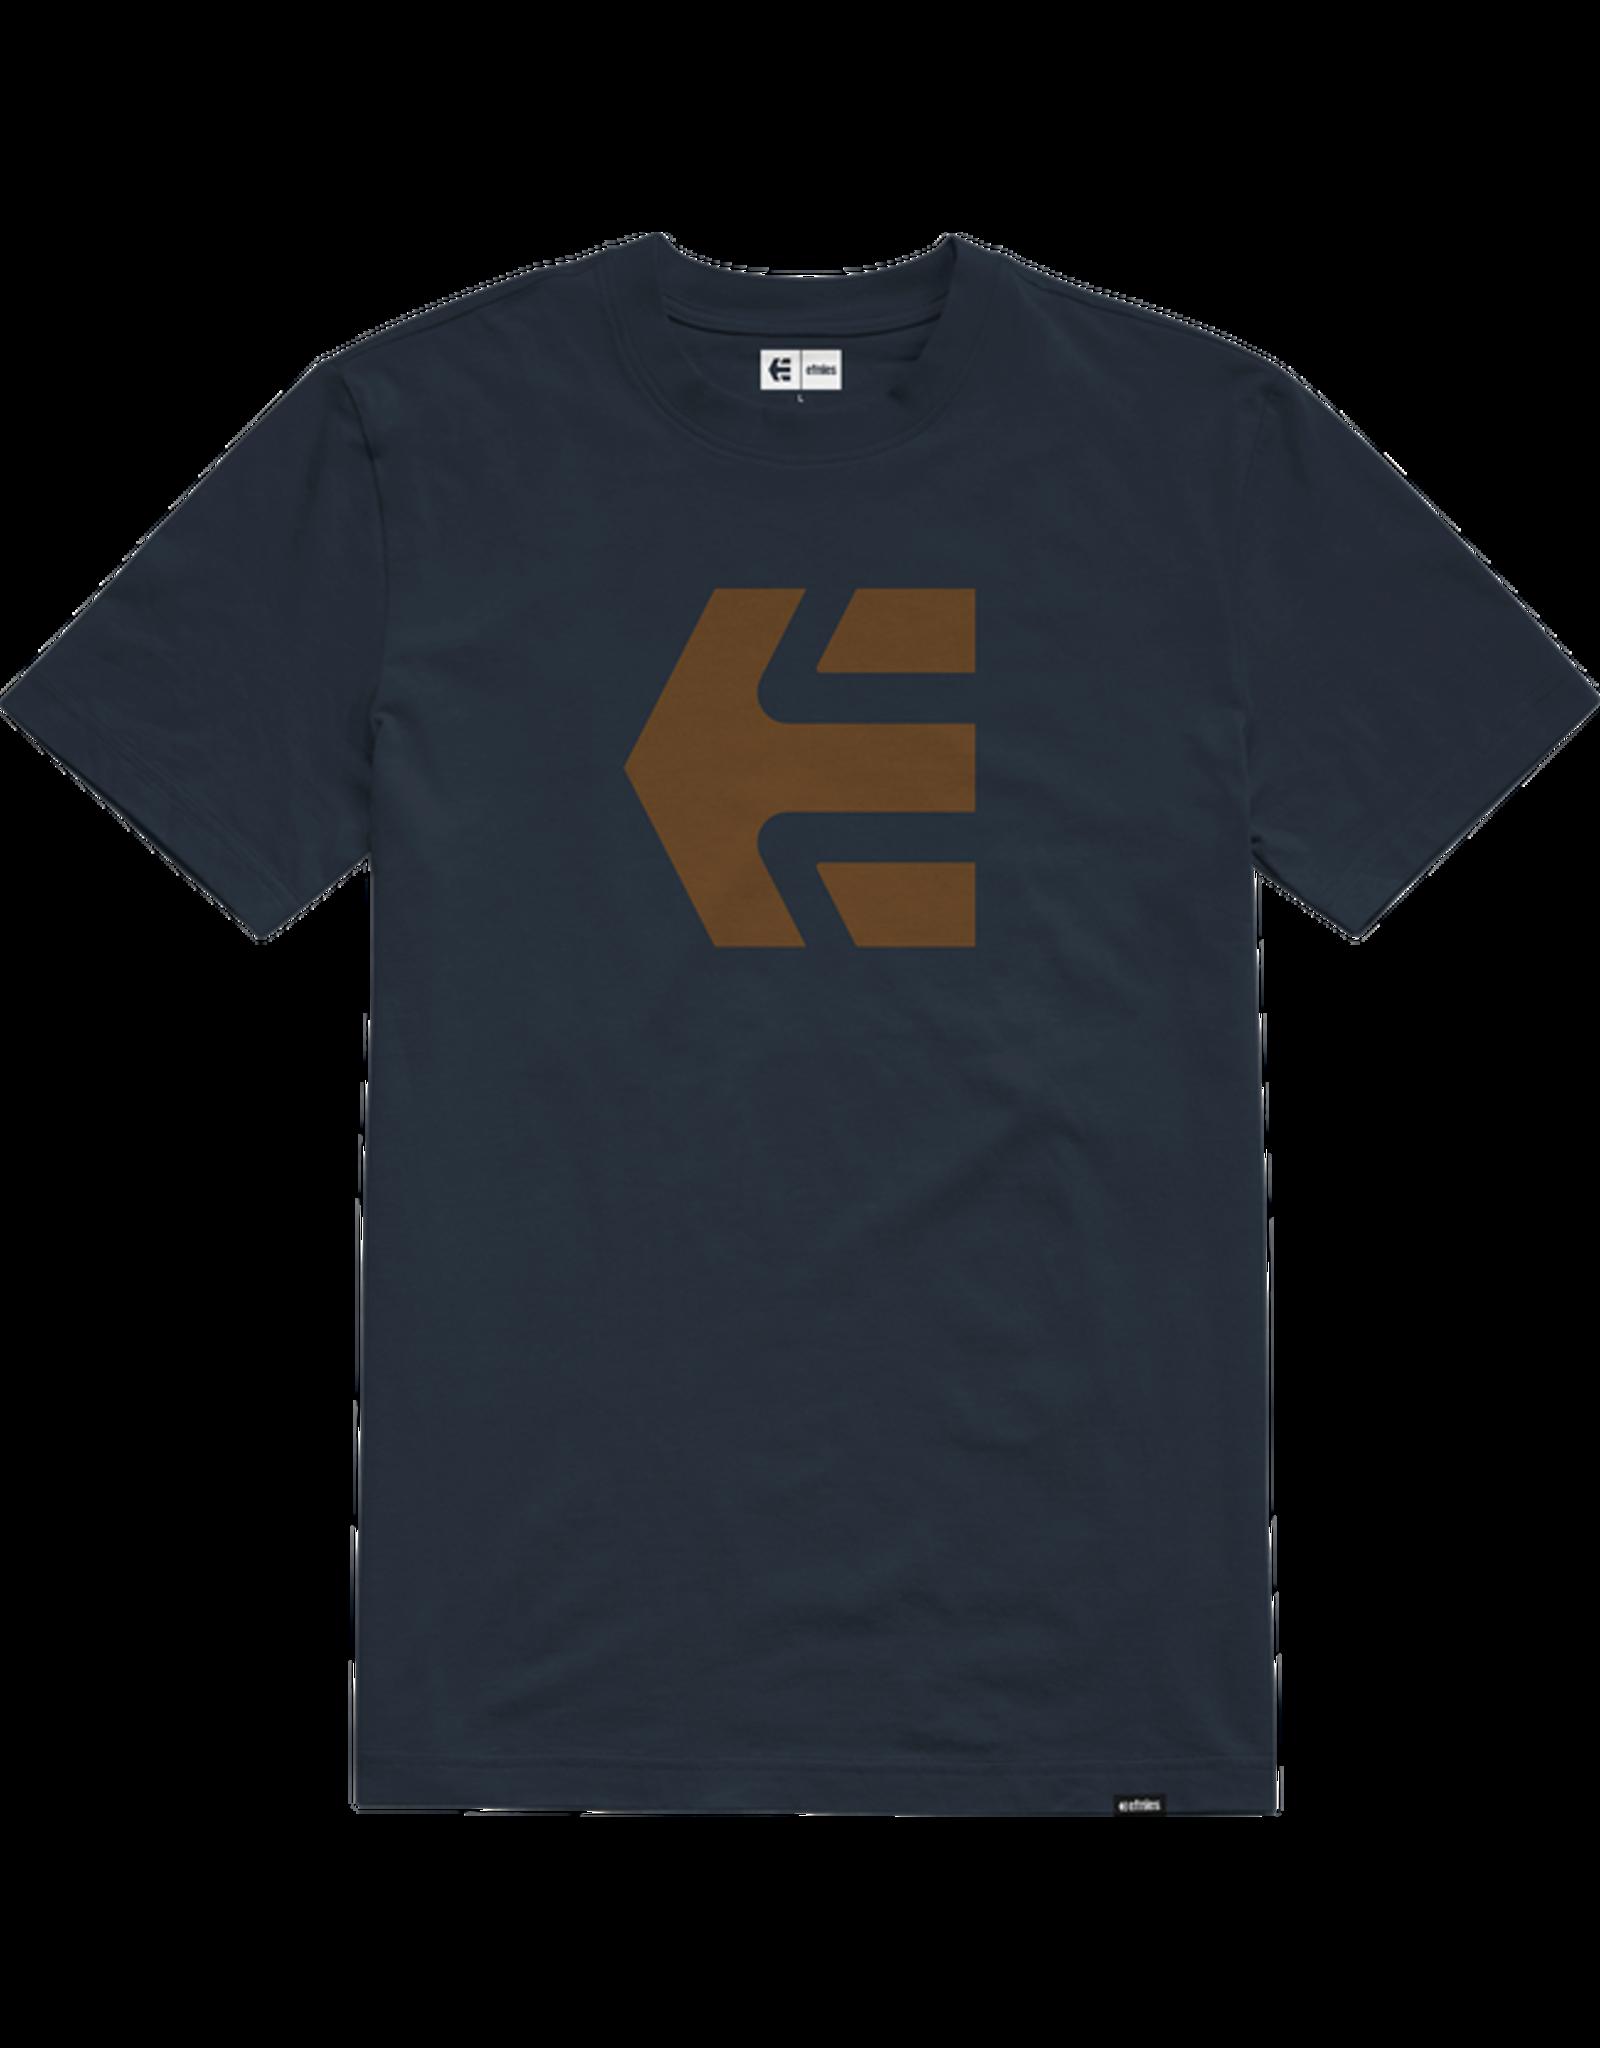 etnies Etnies - T-shirt homme icon navy/gum